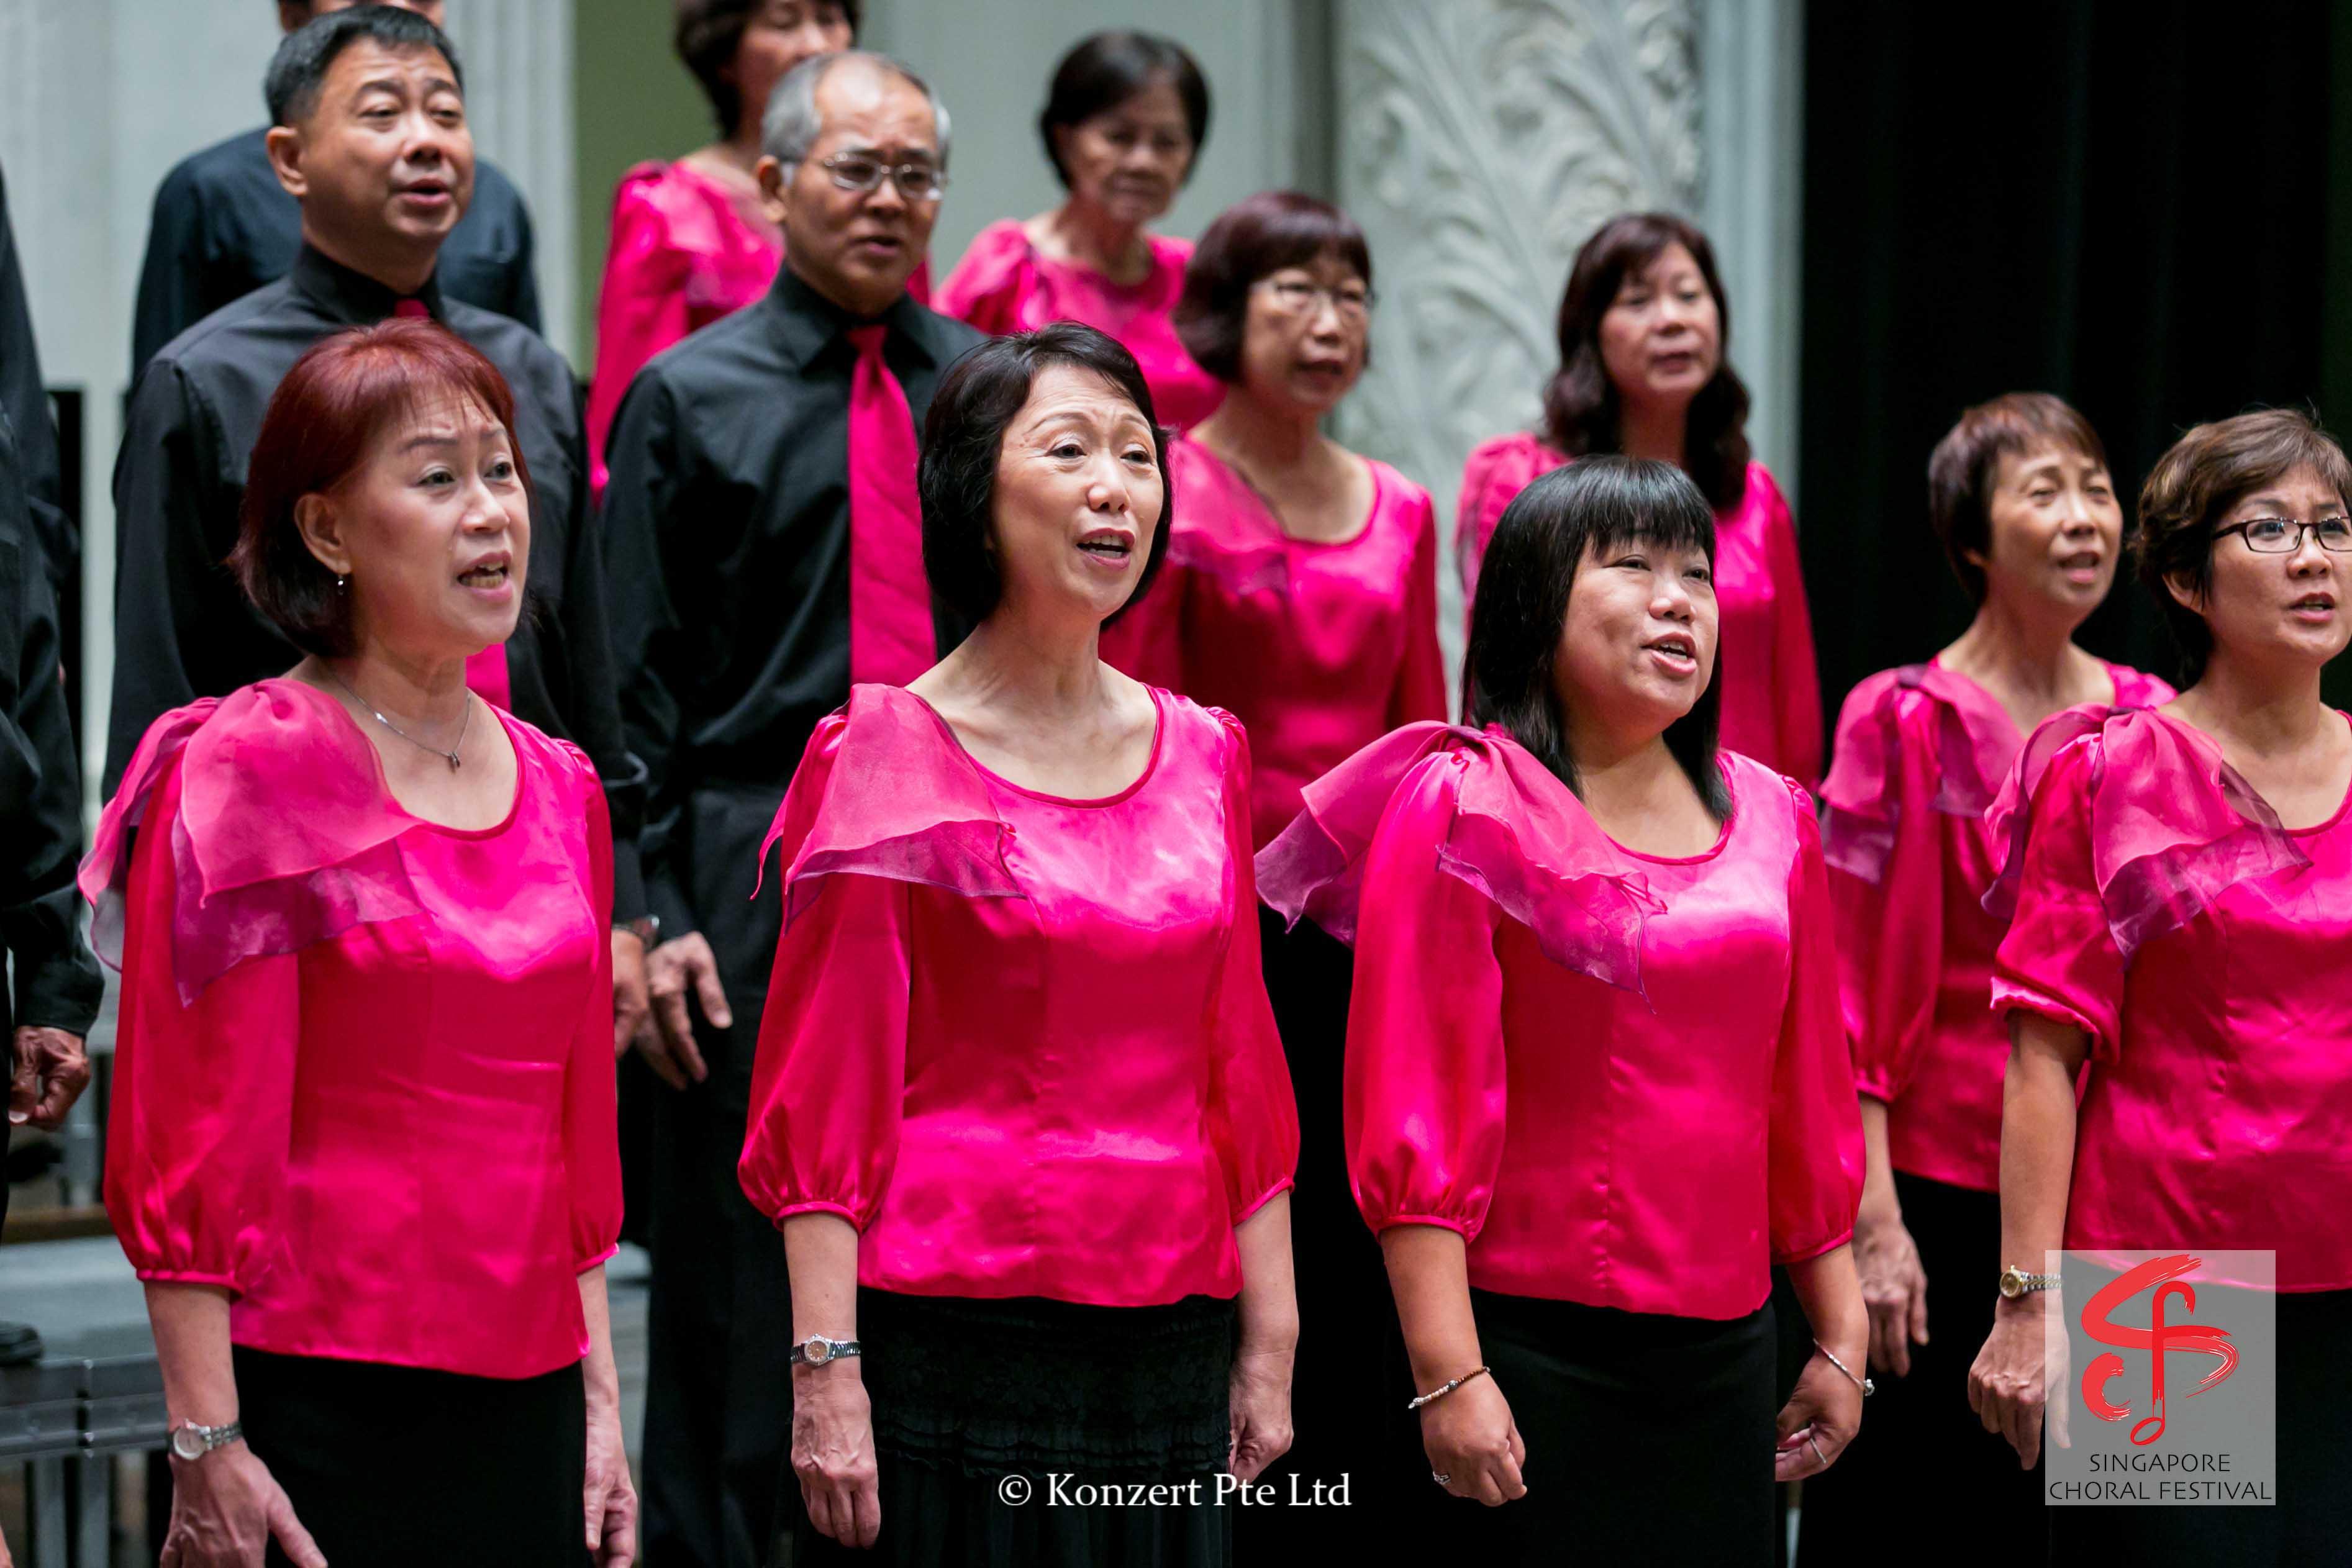 Singapore Choral Festival 7-8-15 (39).jpg